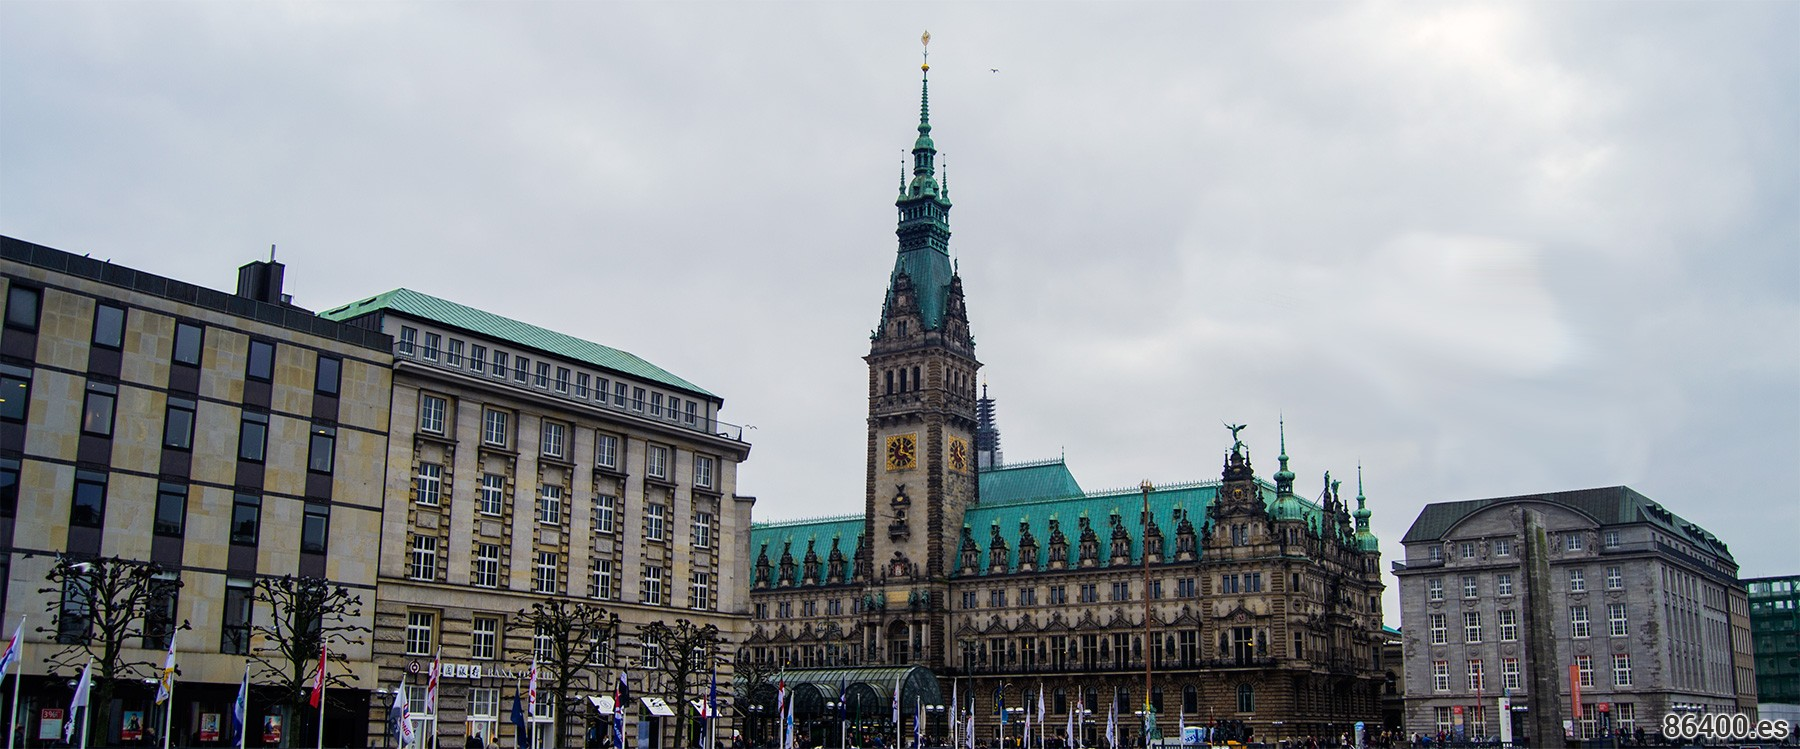 Rathaus o plaza del ayuntamiento Hamburgo